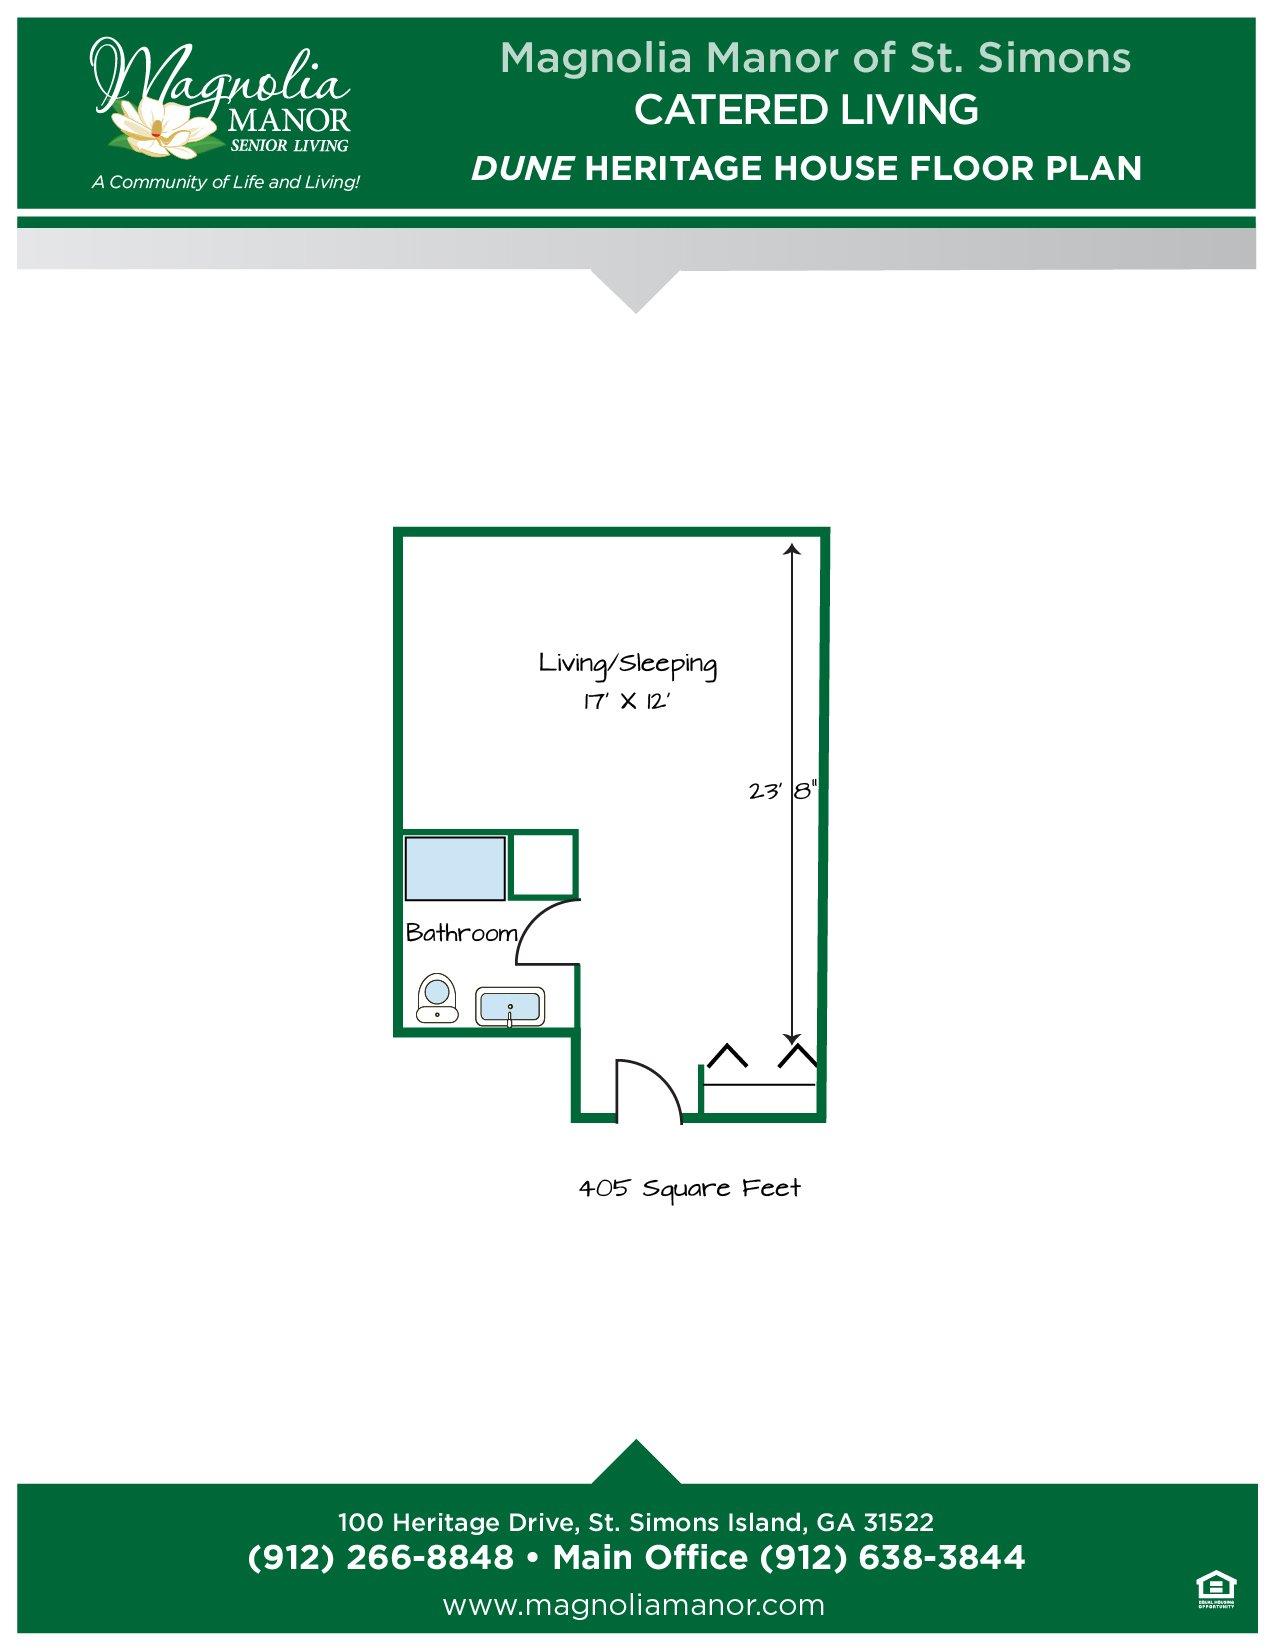 00344 St Simons CC Dune Heritage House Floor Plans 2019-01